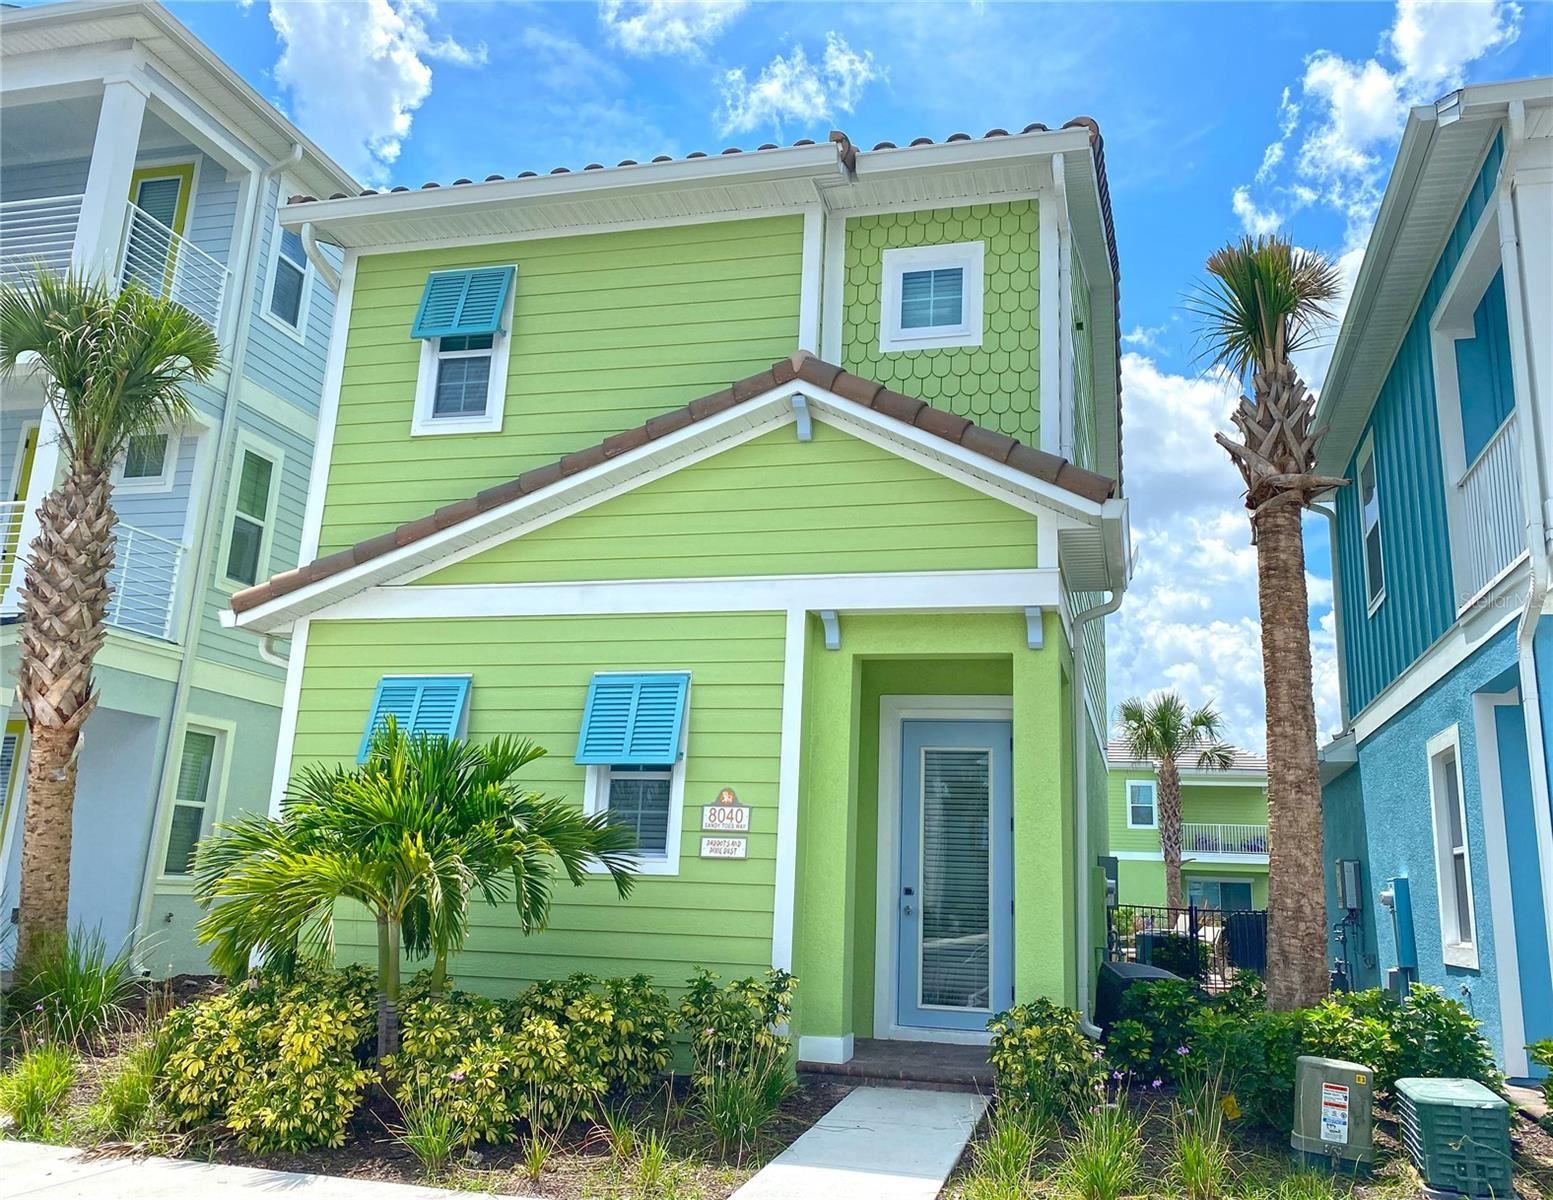 8040 SANDY TOES WAY, Kissimmee, FL 34747 - #: O5964523